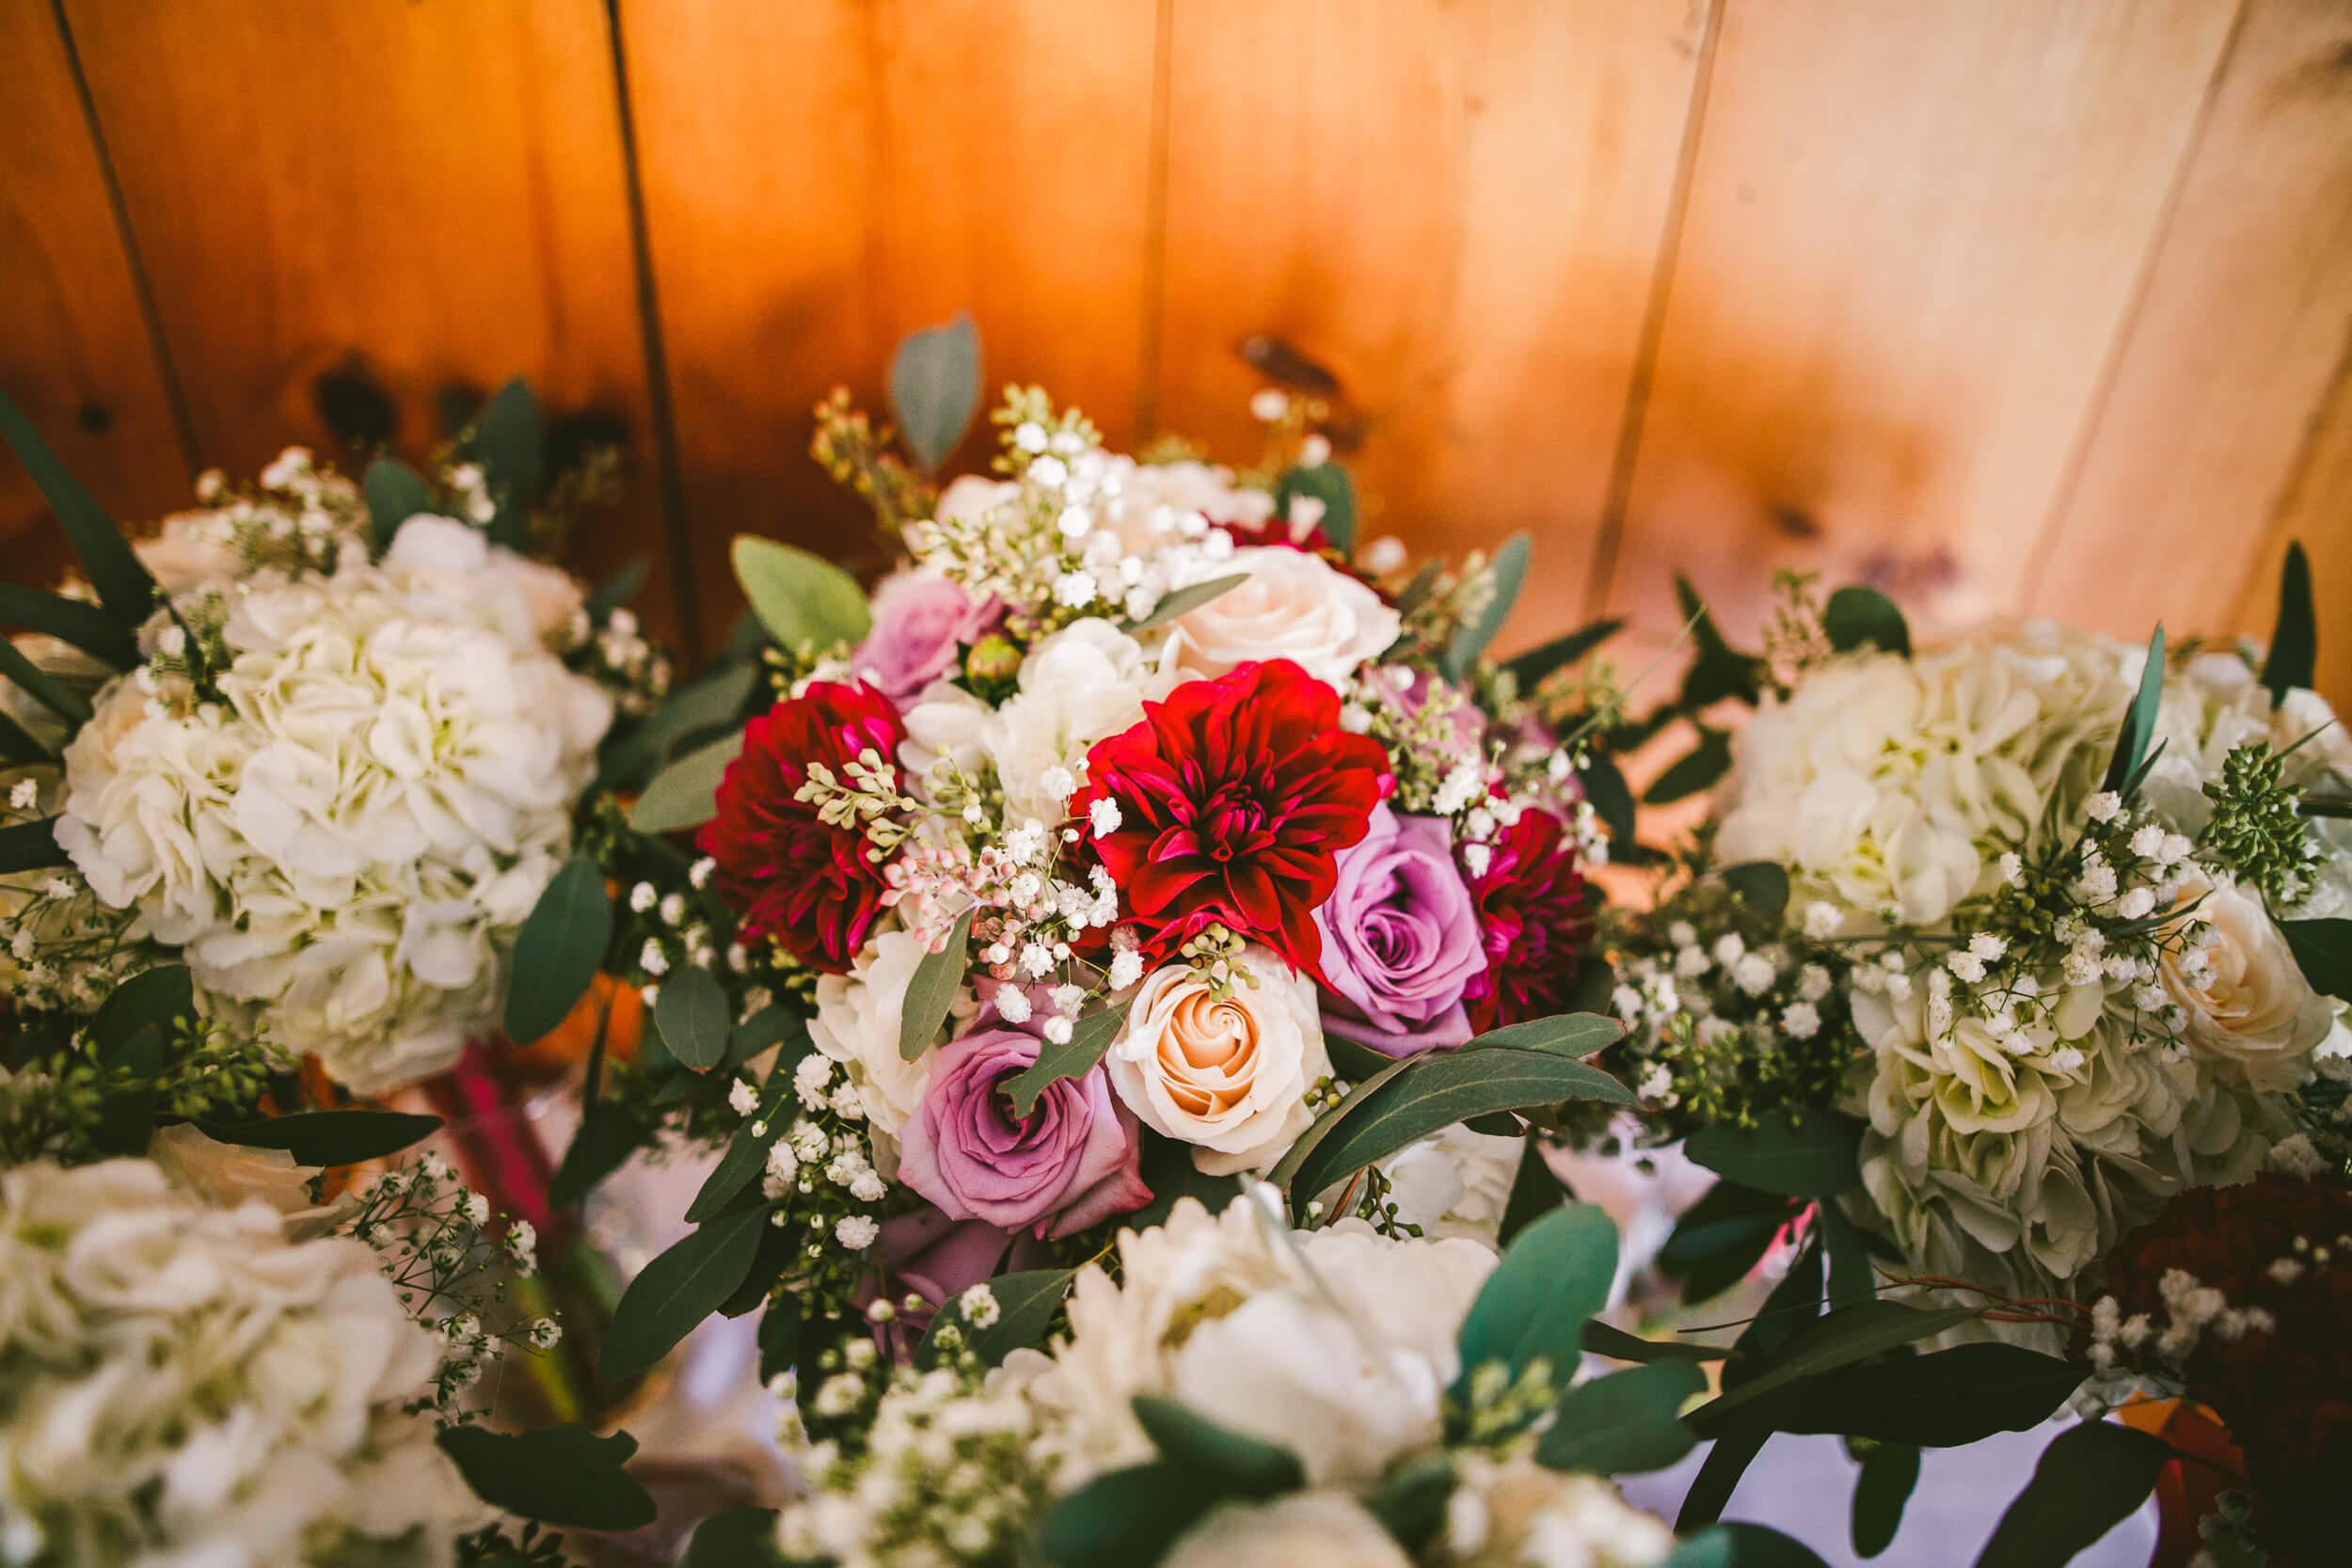 mukogawa winter wedding in spokane (15).jpg